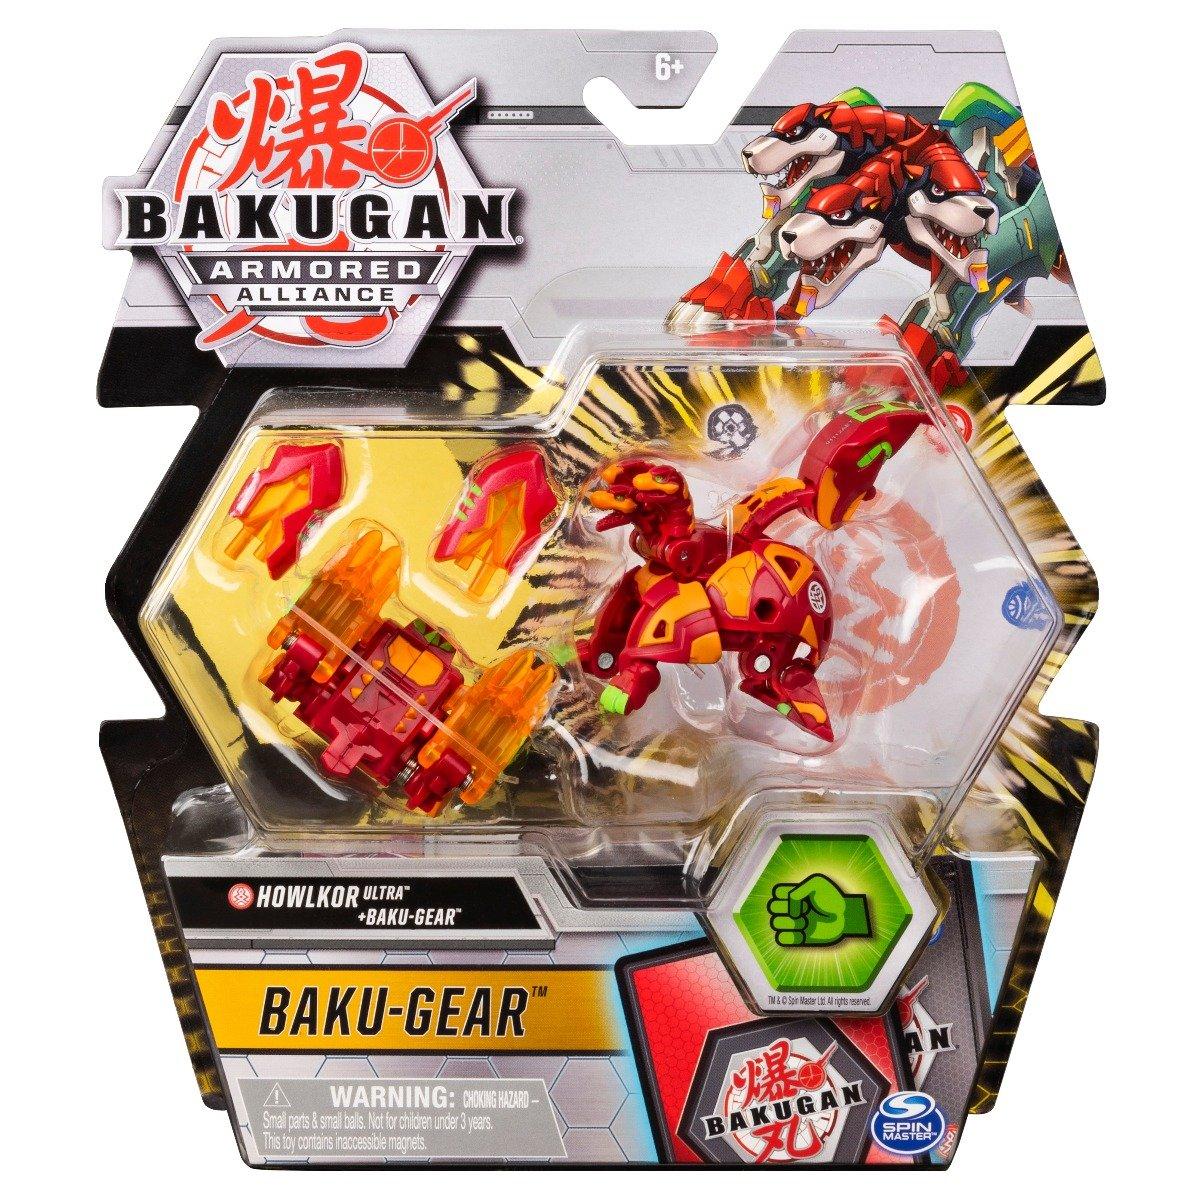 Figurina Bakugan Armored Alliance, Howlkor Ultra, Baku-Gear 20124088